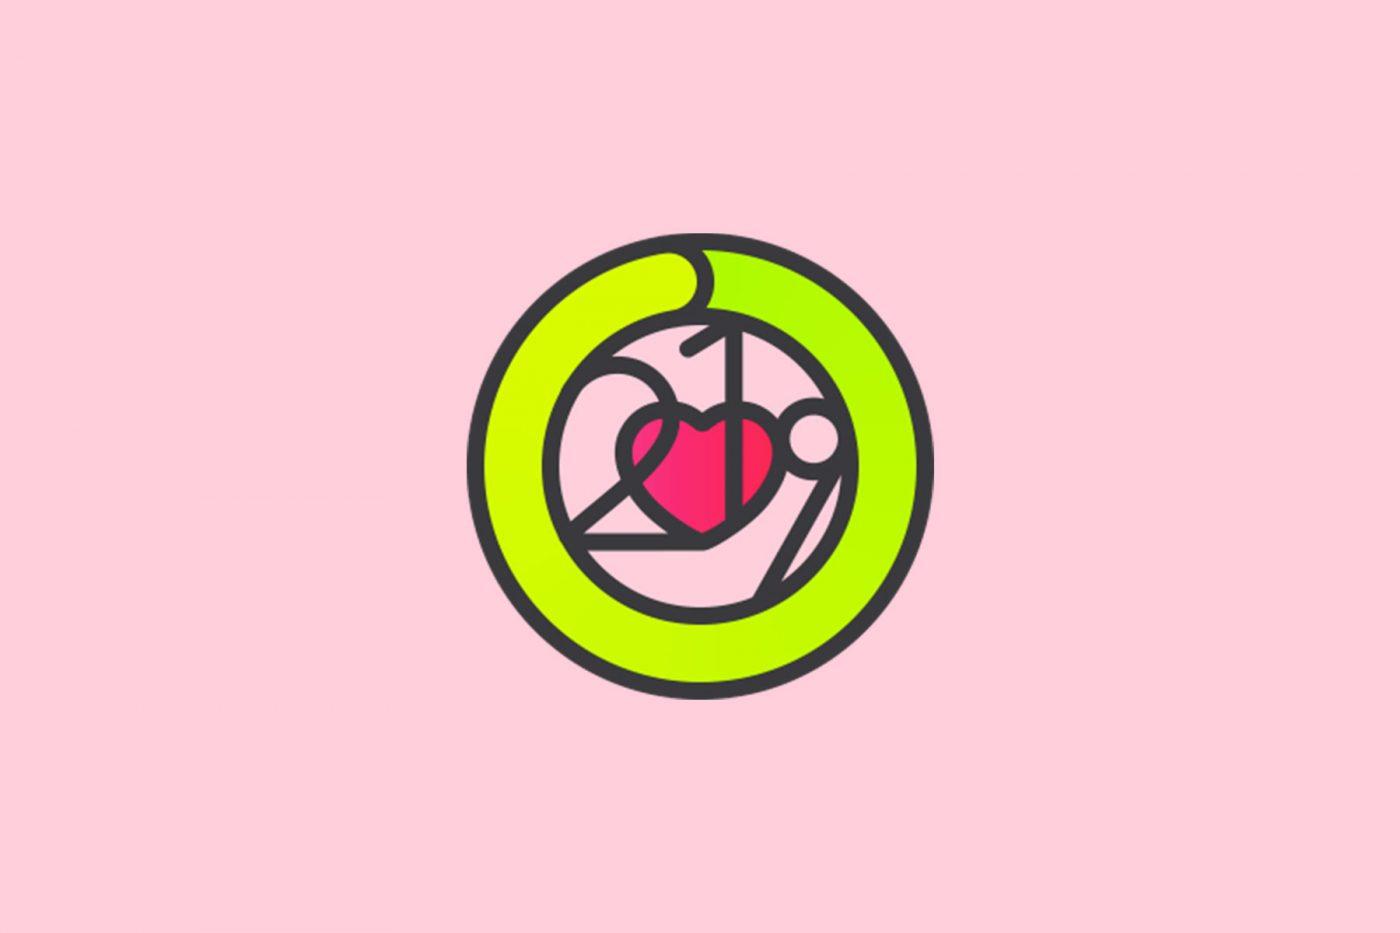 Apple-Watch-February-challenge-award-2019